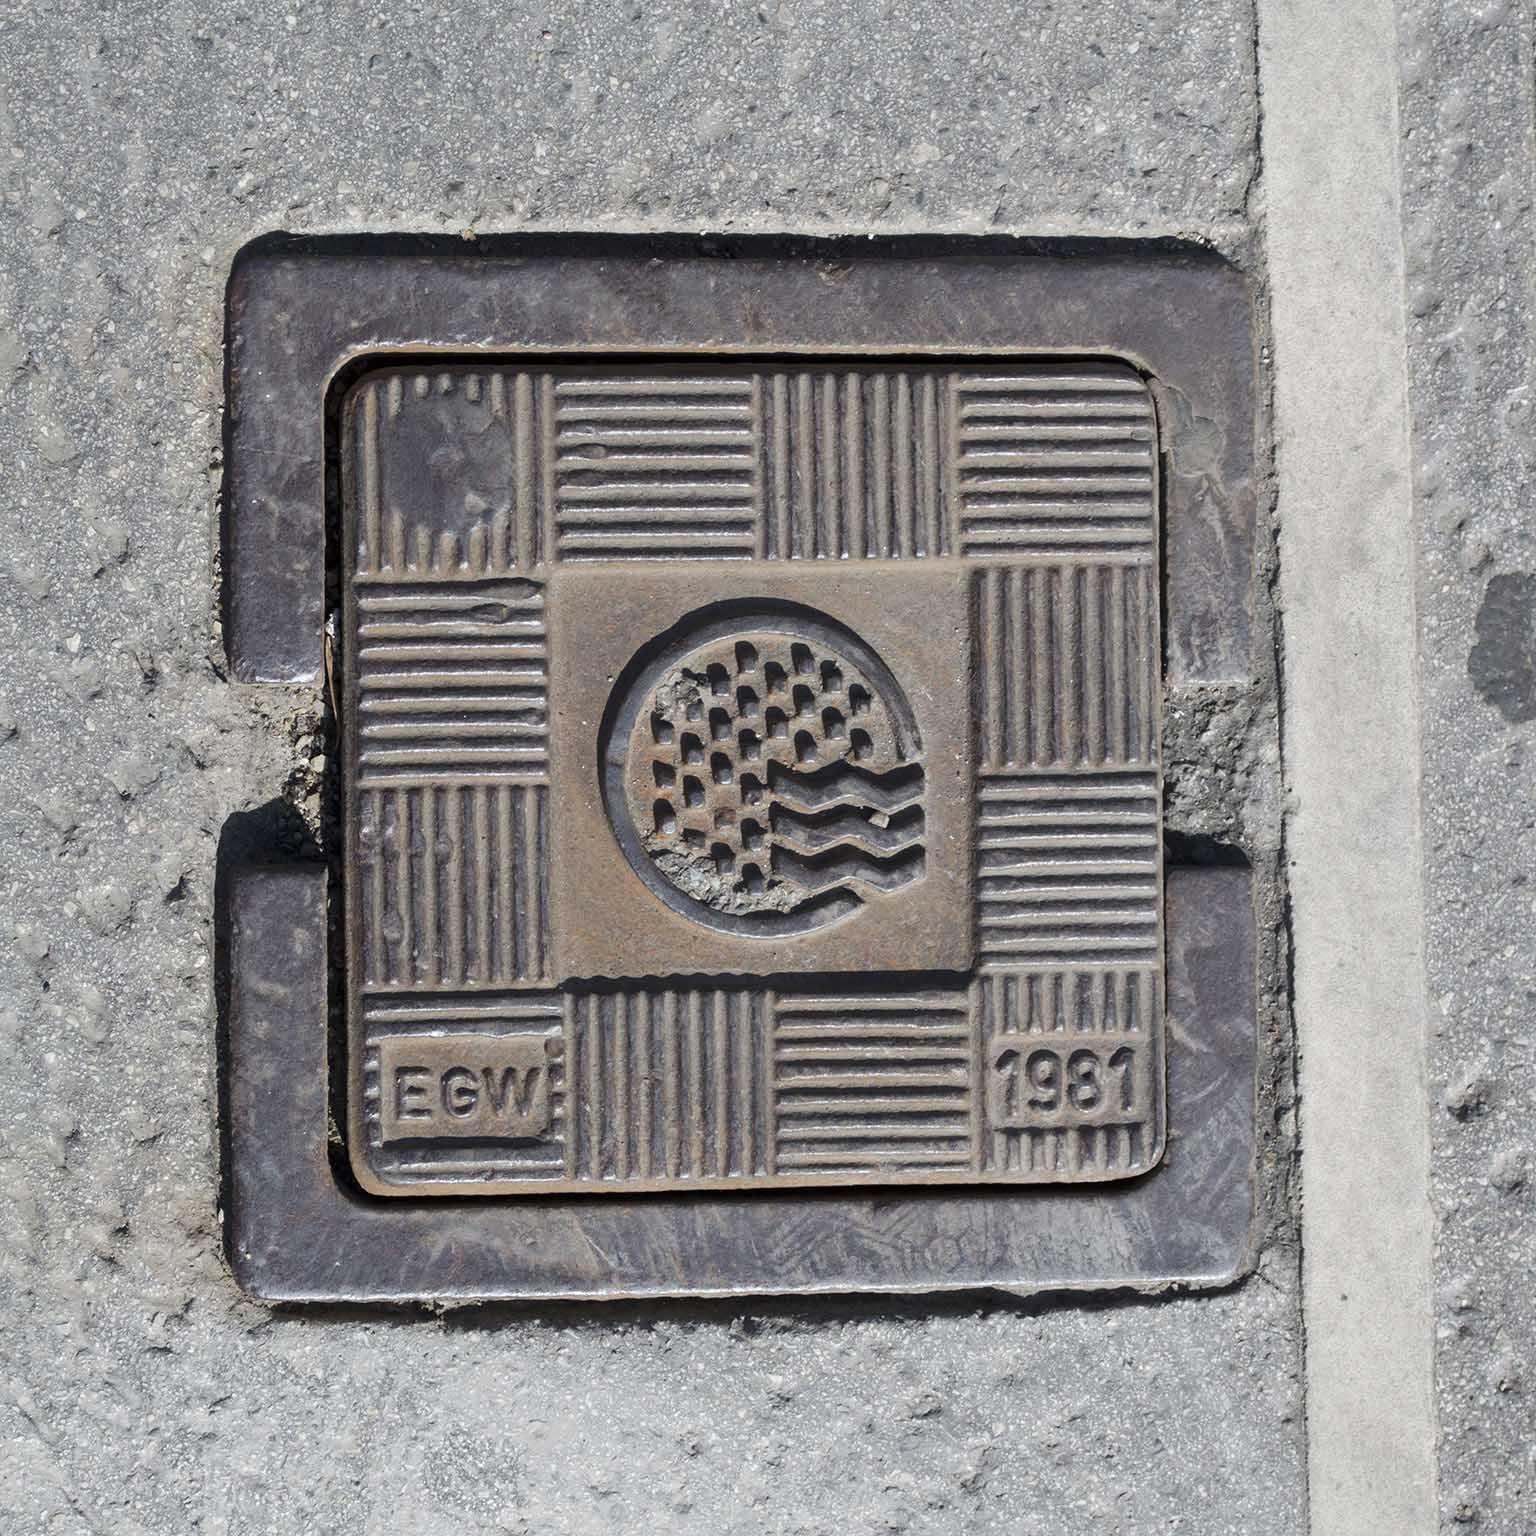 Wastewater Access Cover, Vienna, Austria